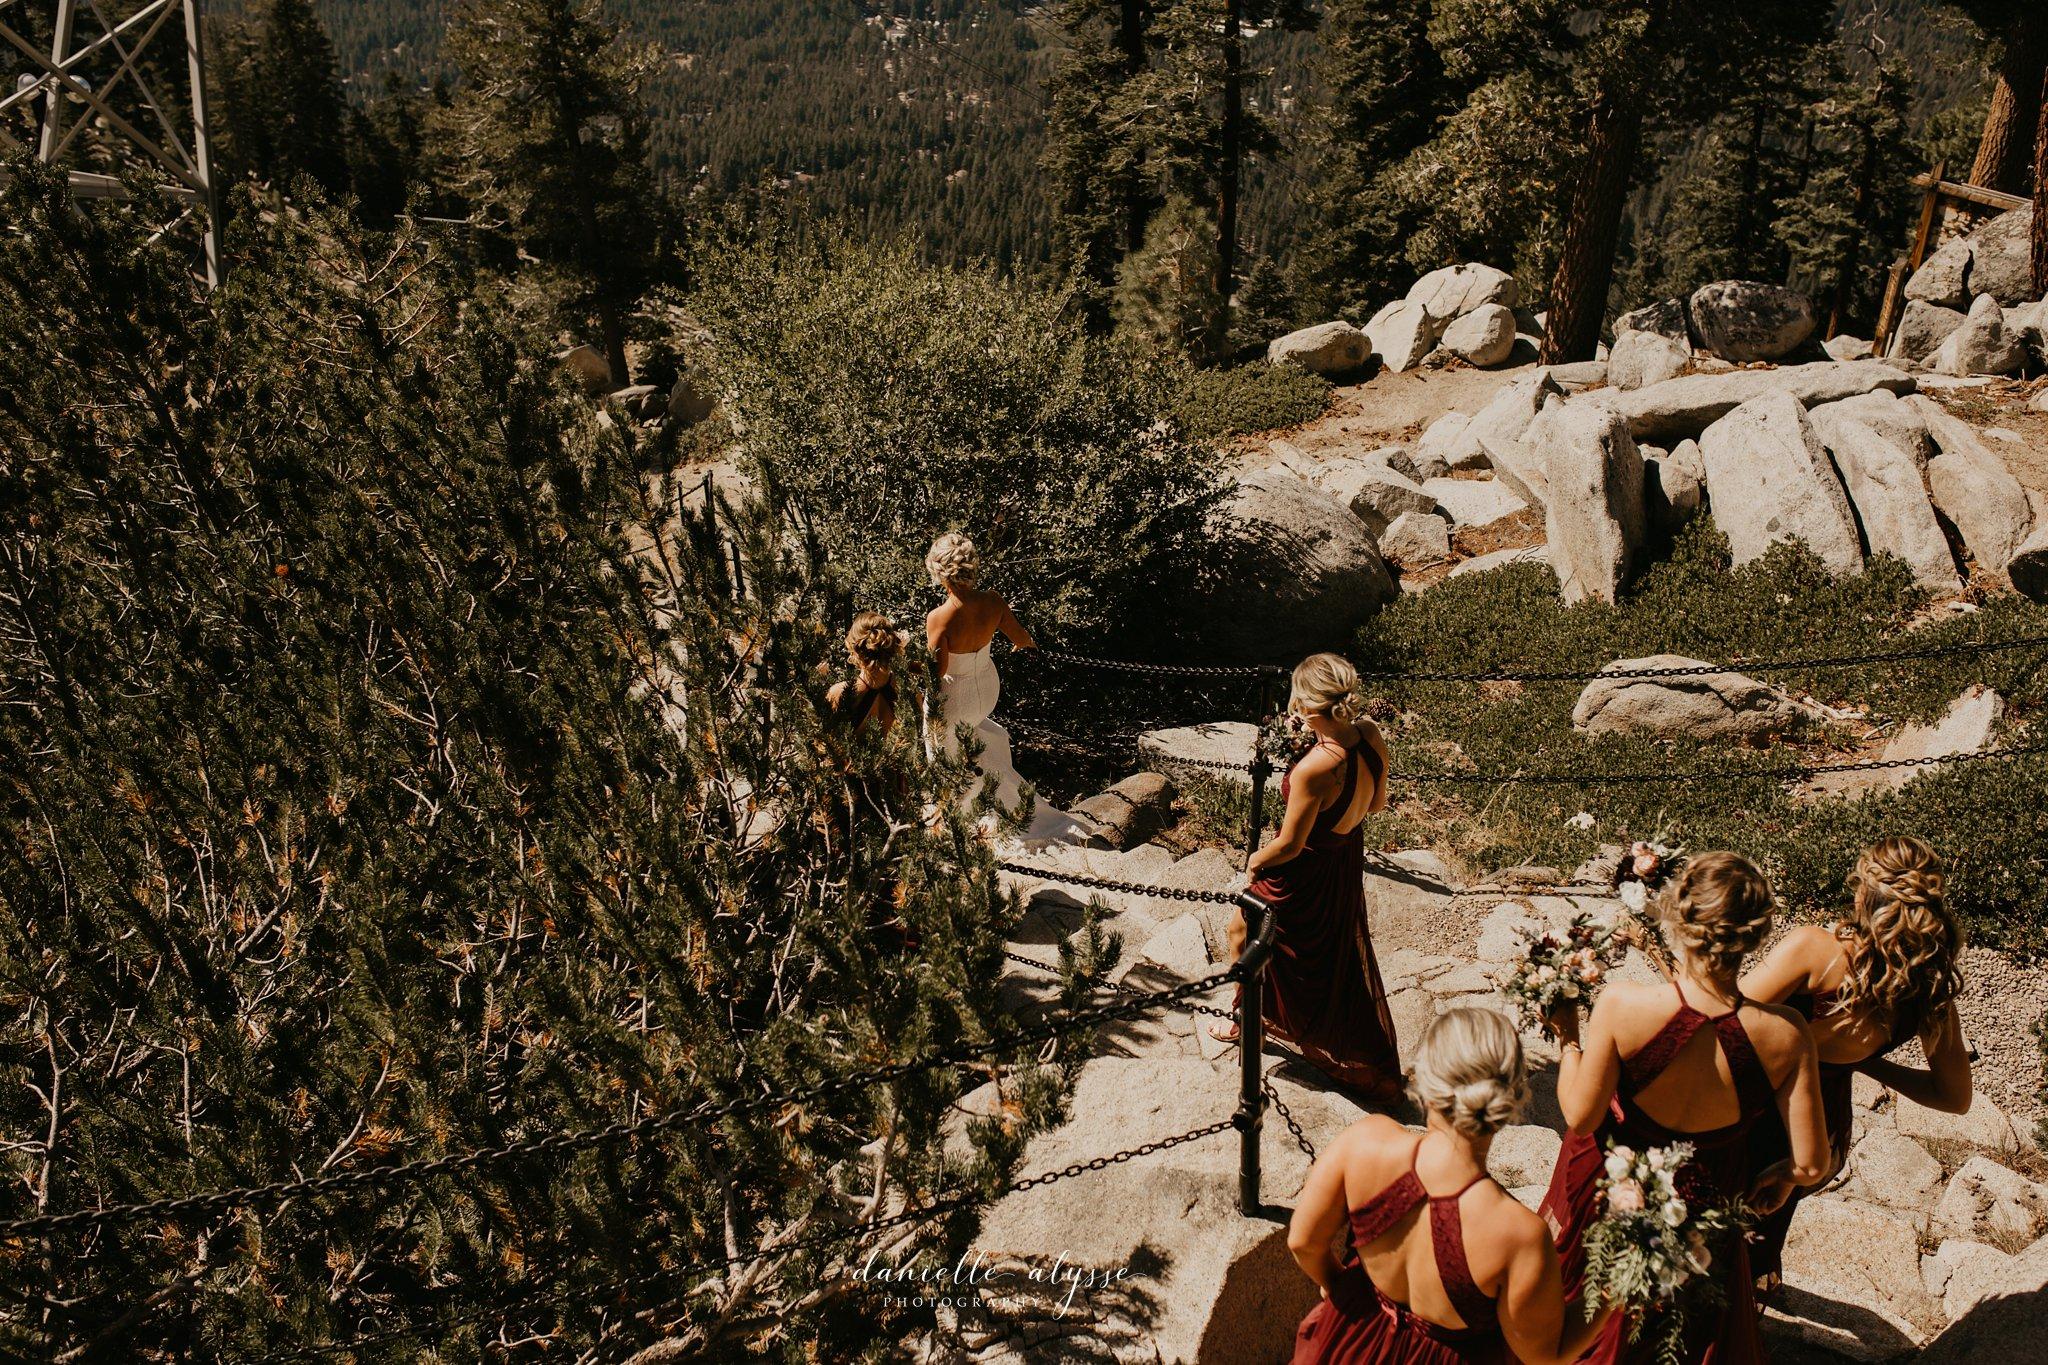 180831_wedding_stephanie_heavenly_south_lake_tahoe_danielle_alysse_photography_destination_blog_273_WEB.jpg